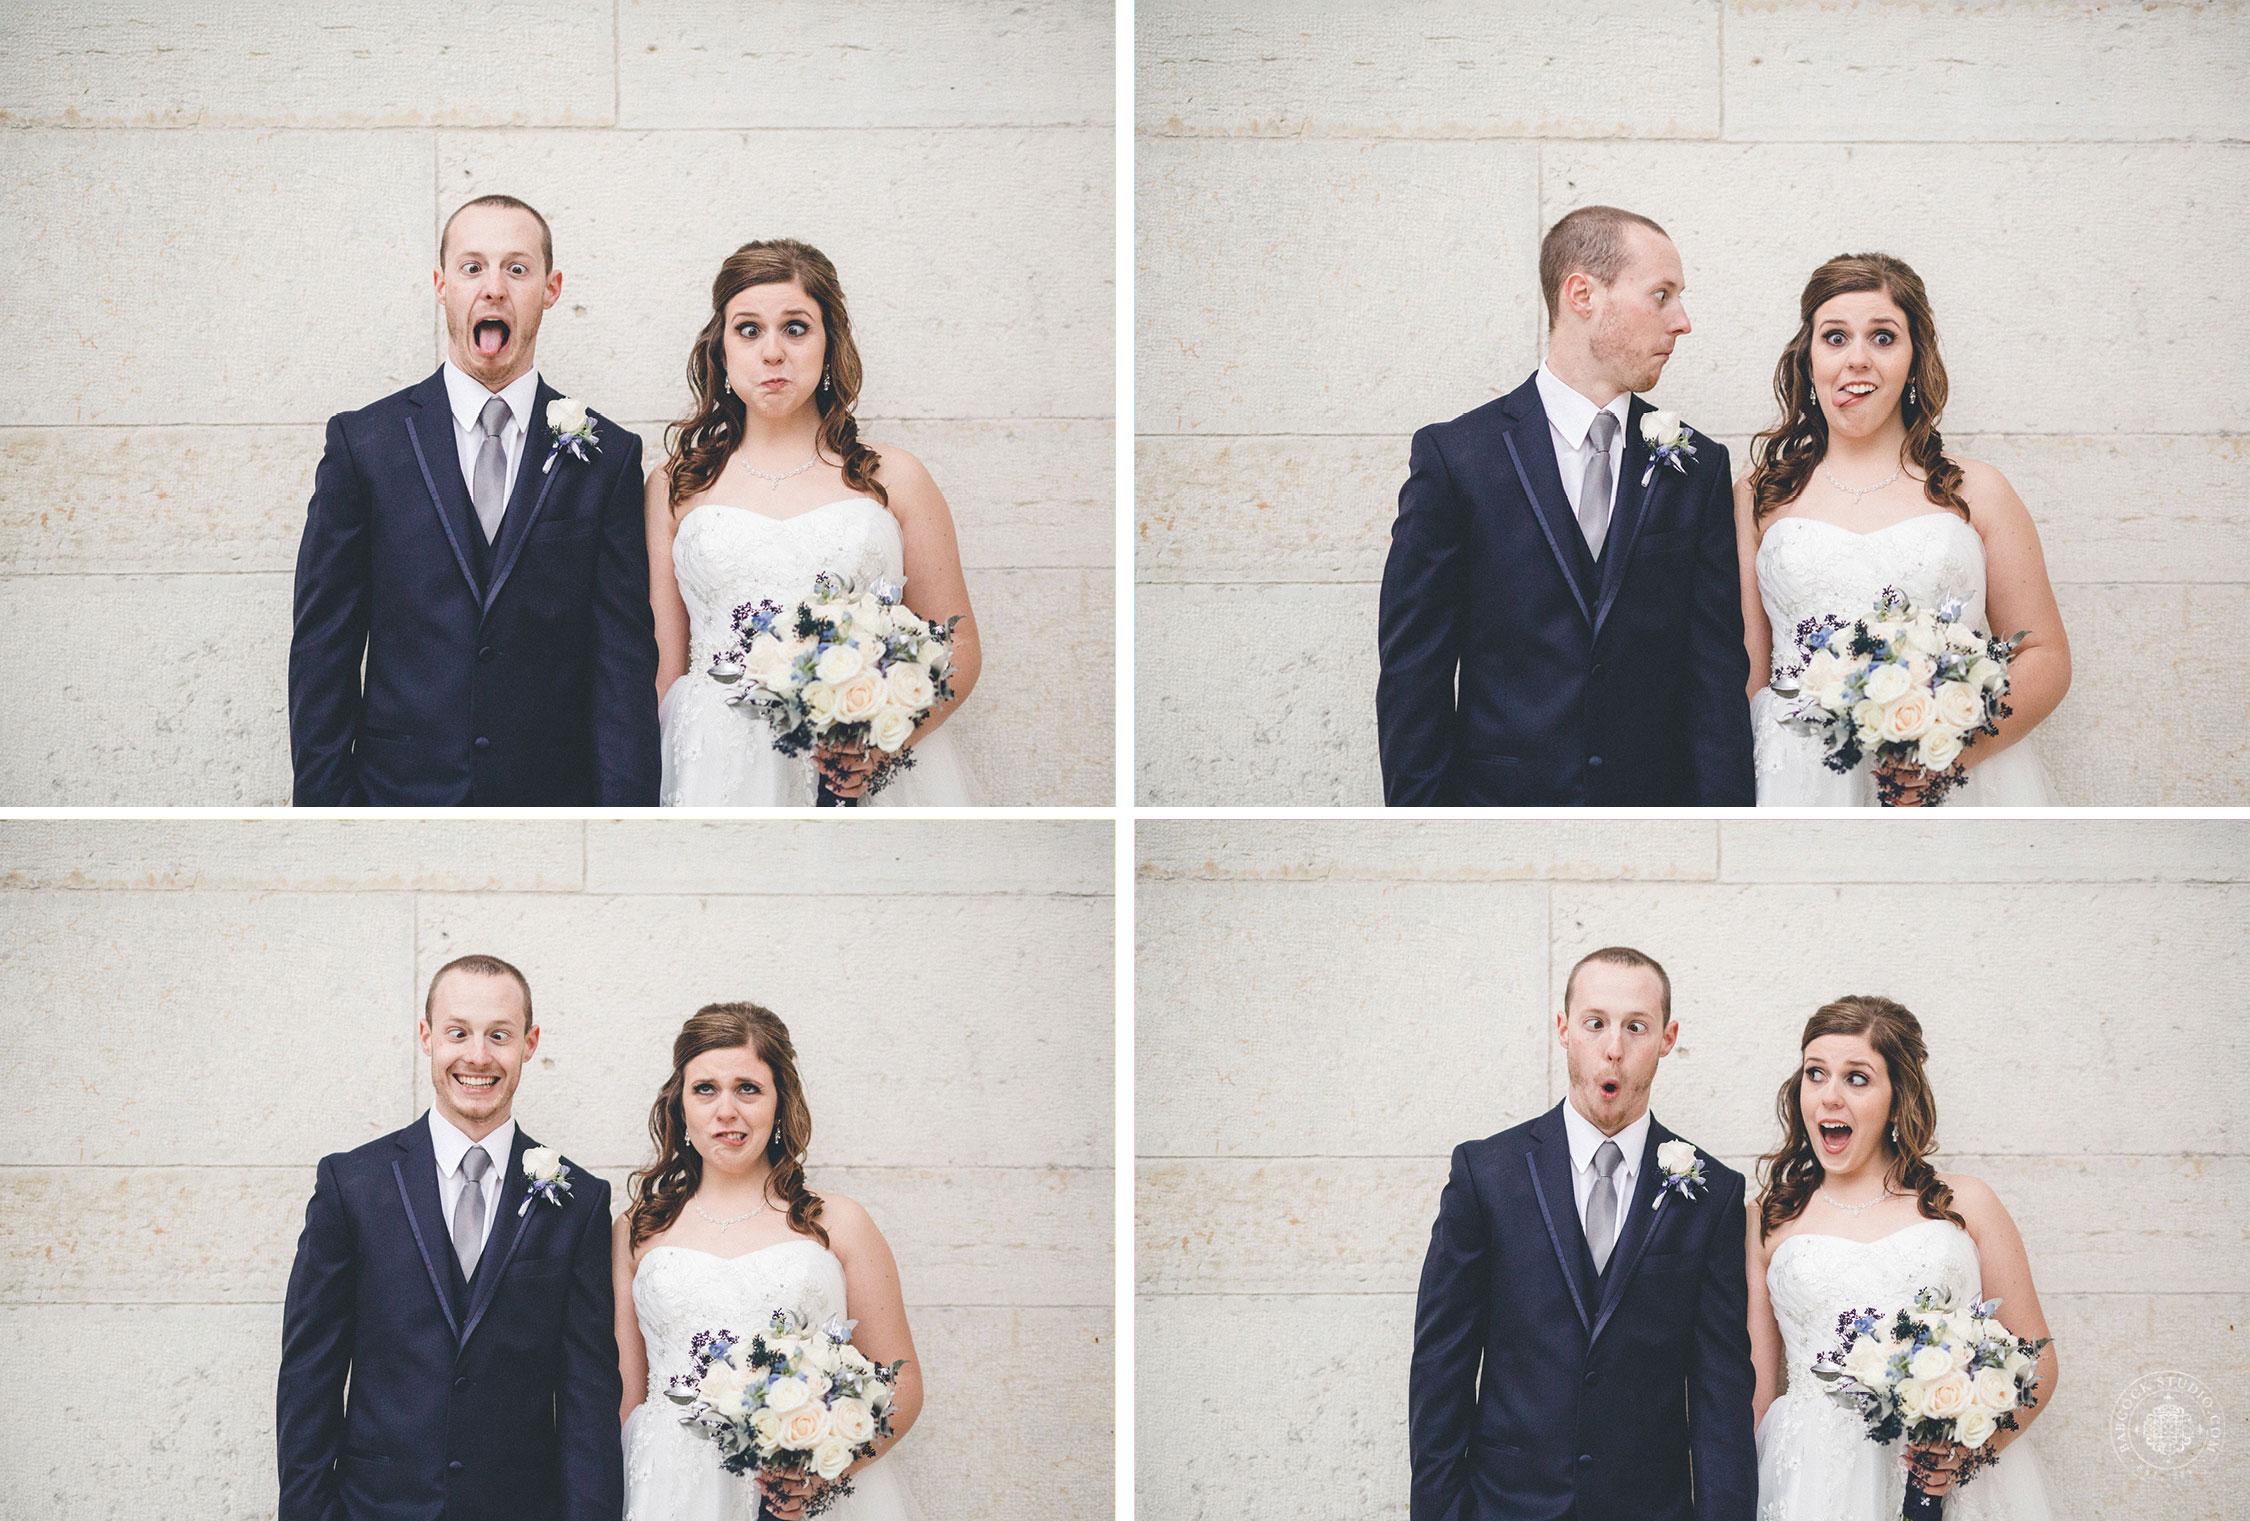 erica-nick-wedding-photographer-dayton-ohio-7.jpg